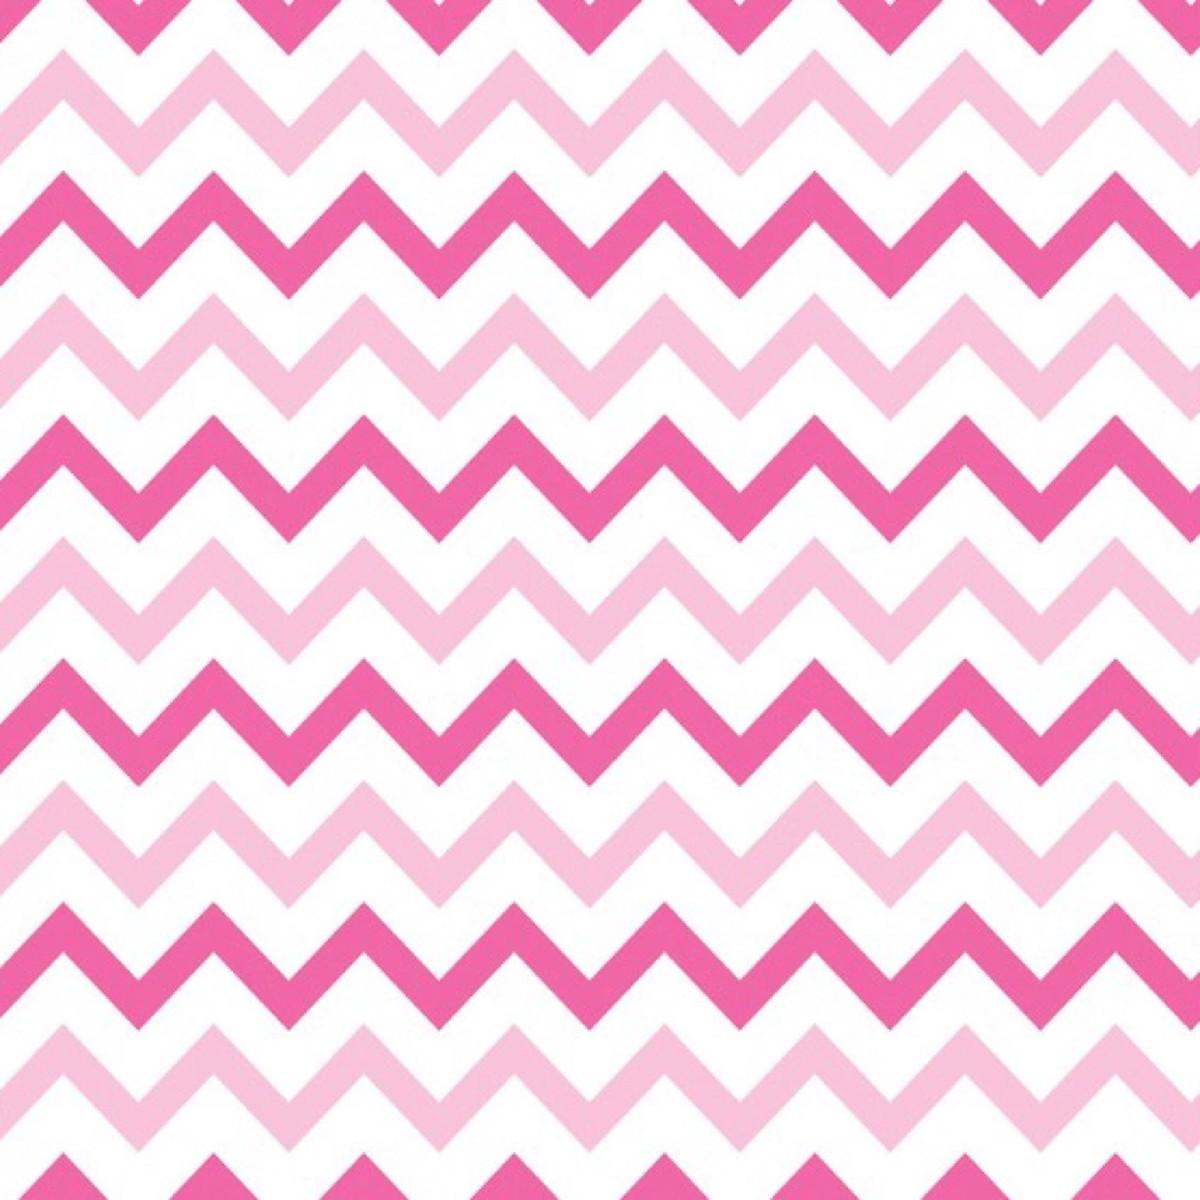 Papel de parede chevron rosa decoraplus elo7 for Papel decorado rosa